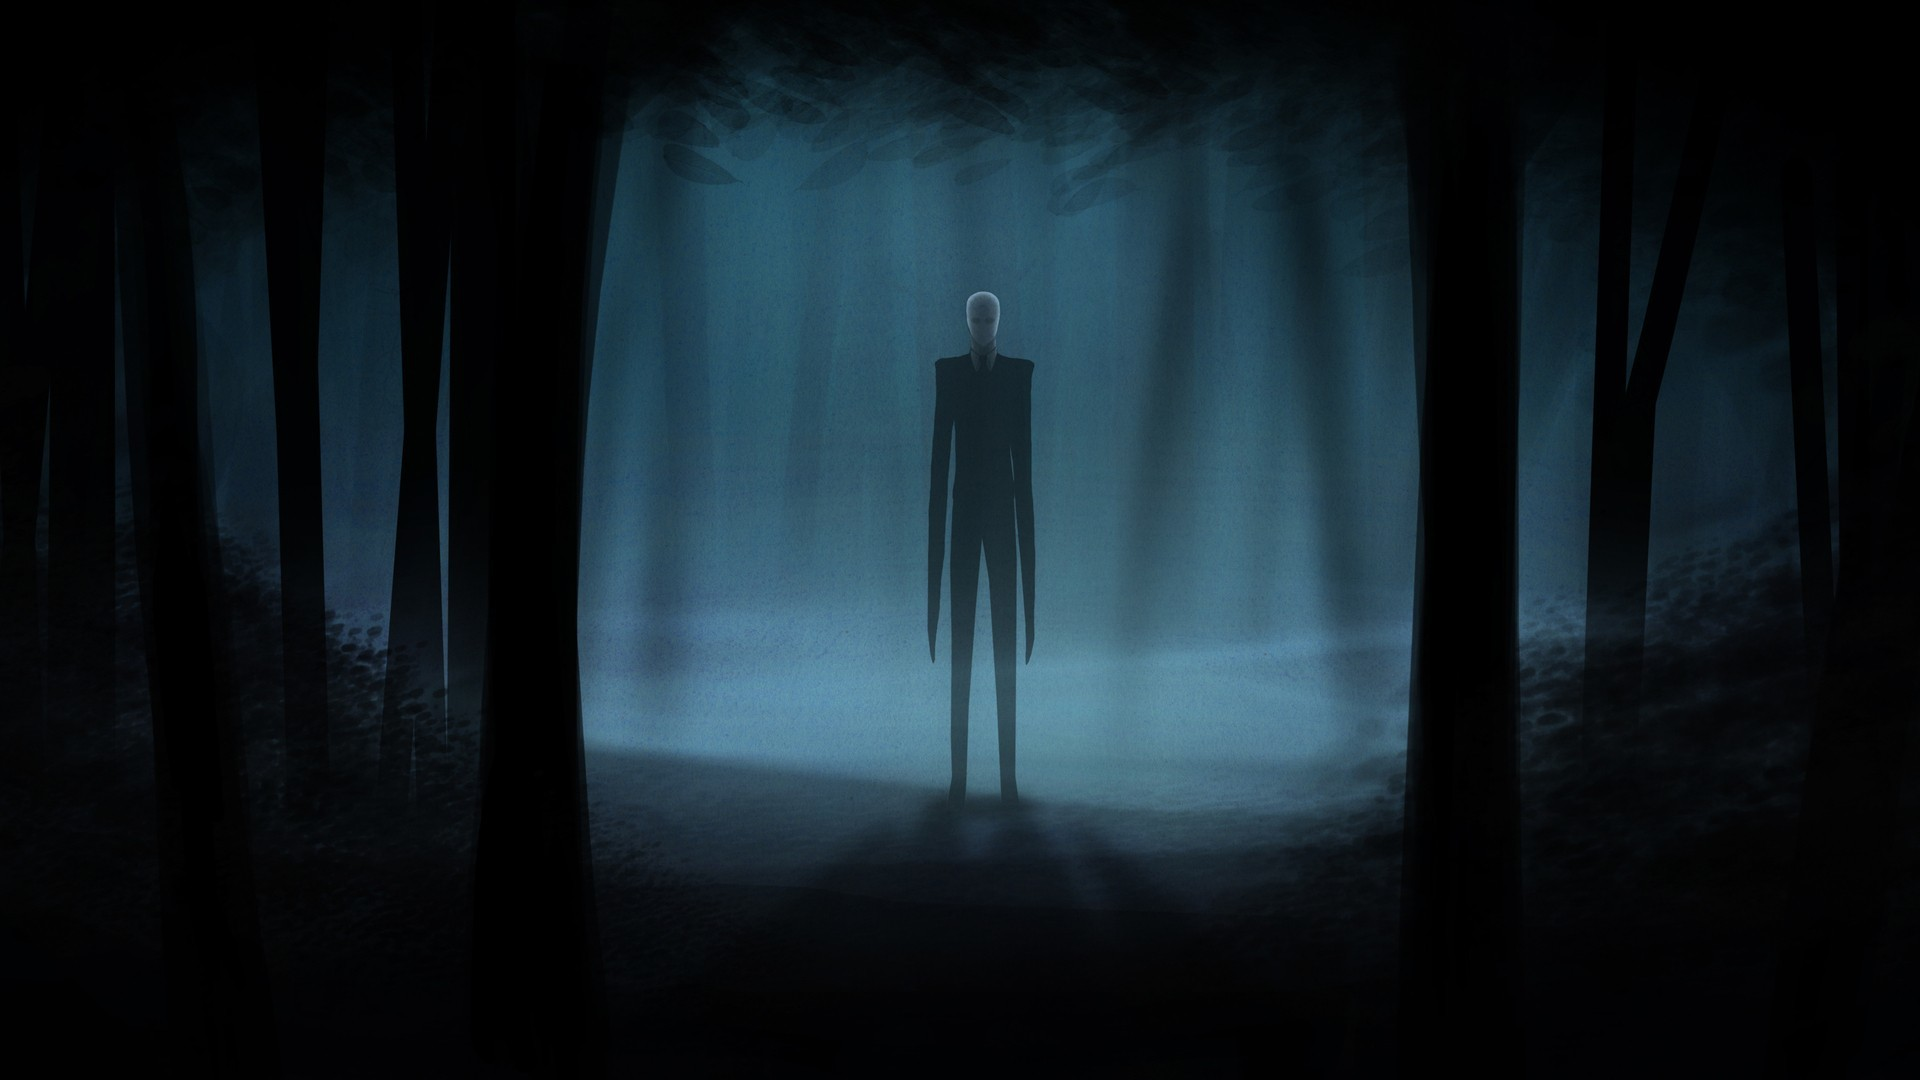 Slender Man Creepy Dark videogames dark horror trees forest wallpaper .